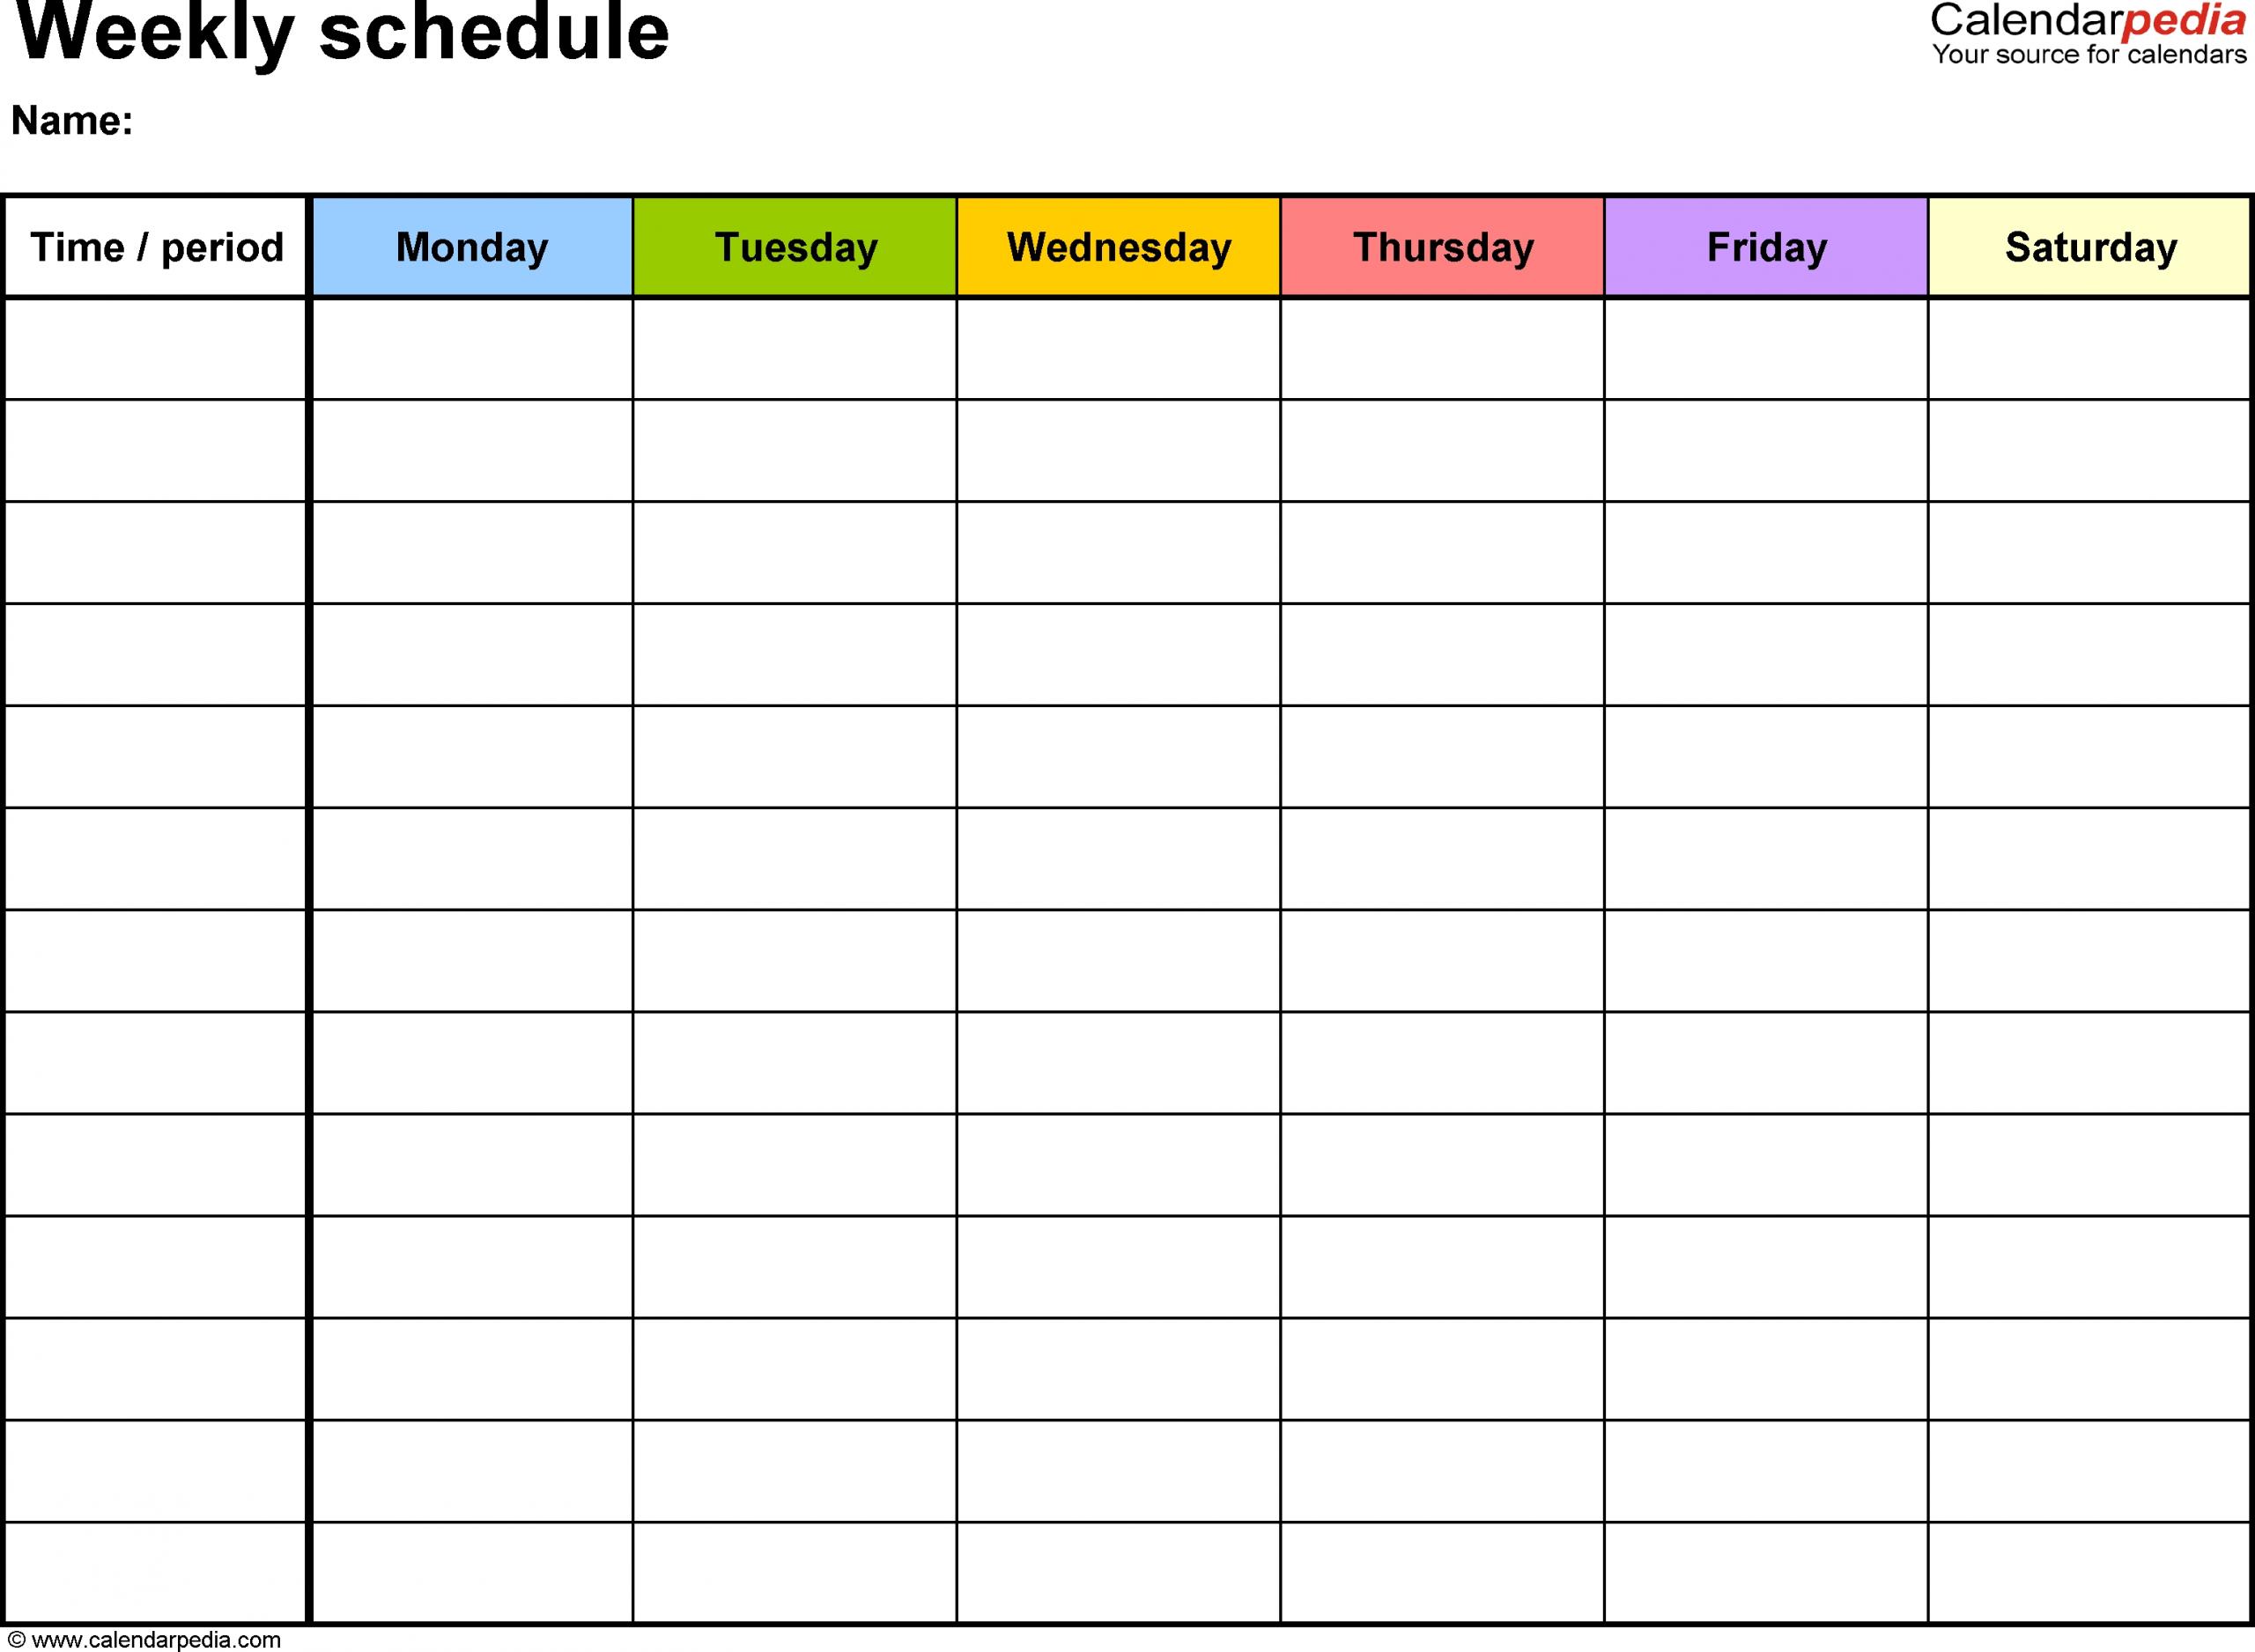 Monday To Friday Blank Calendar Printable | Calendar Free Printable Monday To Friday Calendar